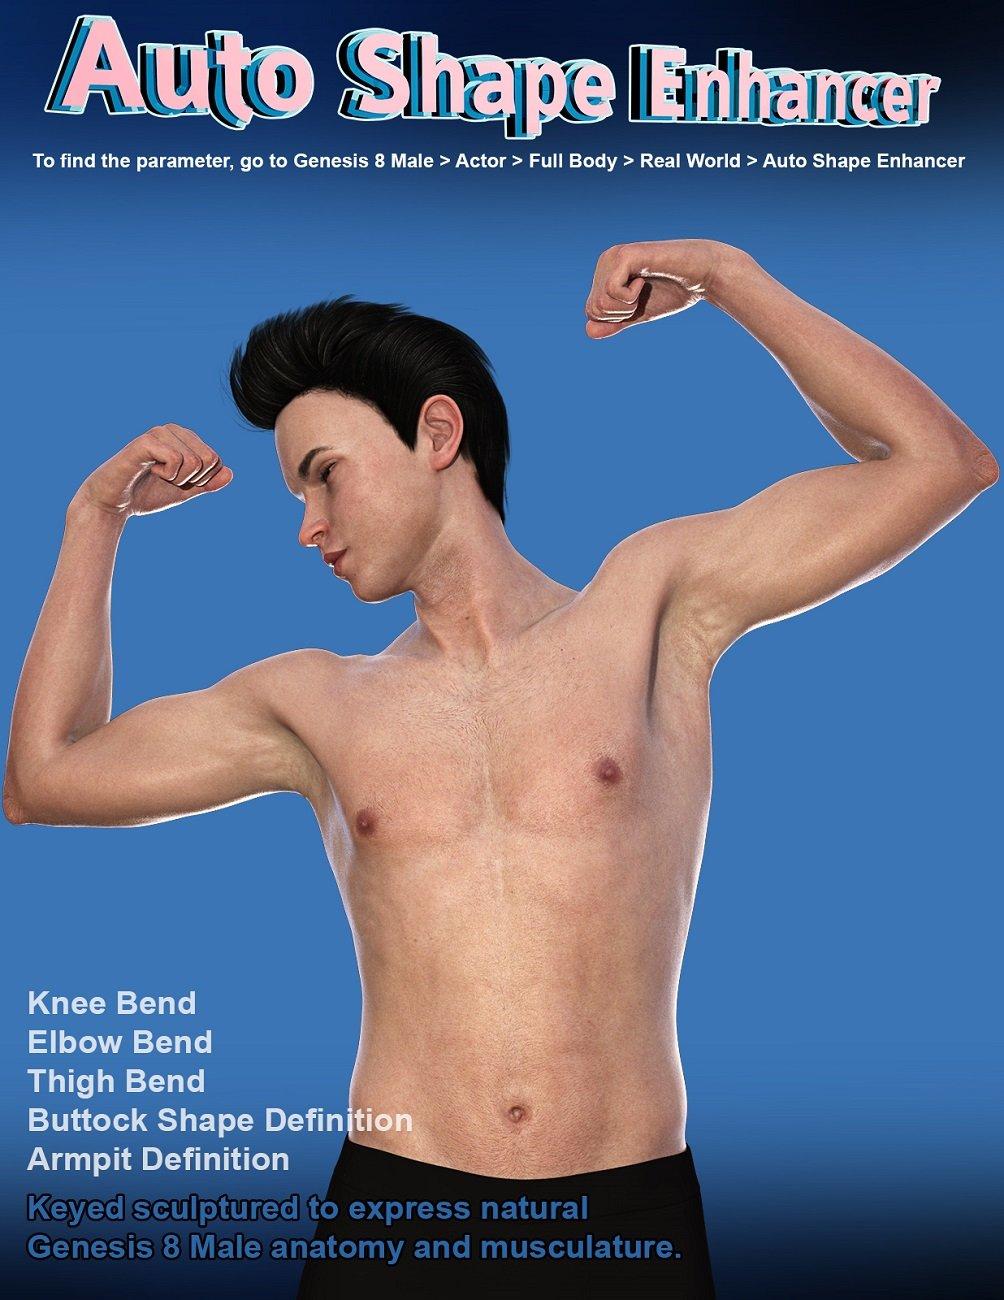 Auto Shape Enhancer for Genesis 8 Male by: D.Master, 3D Models by Daz 3D